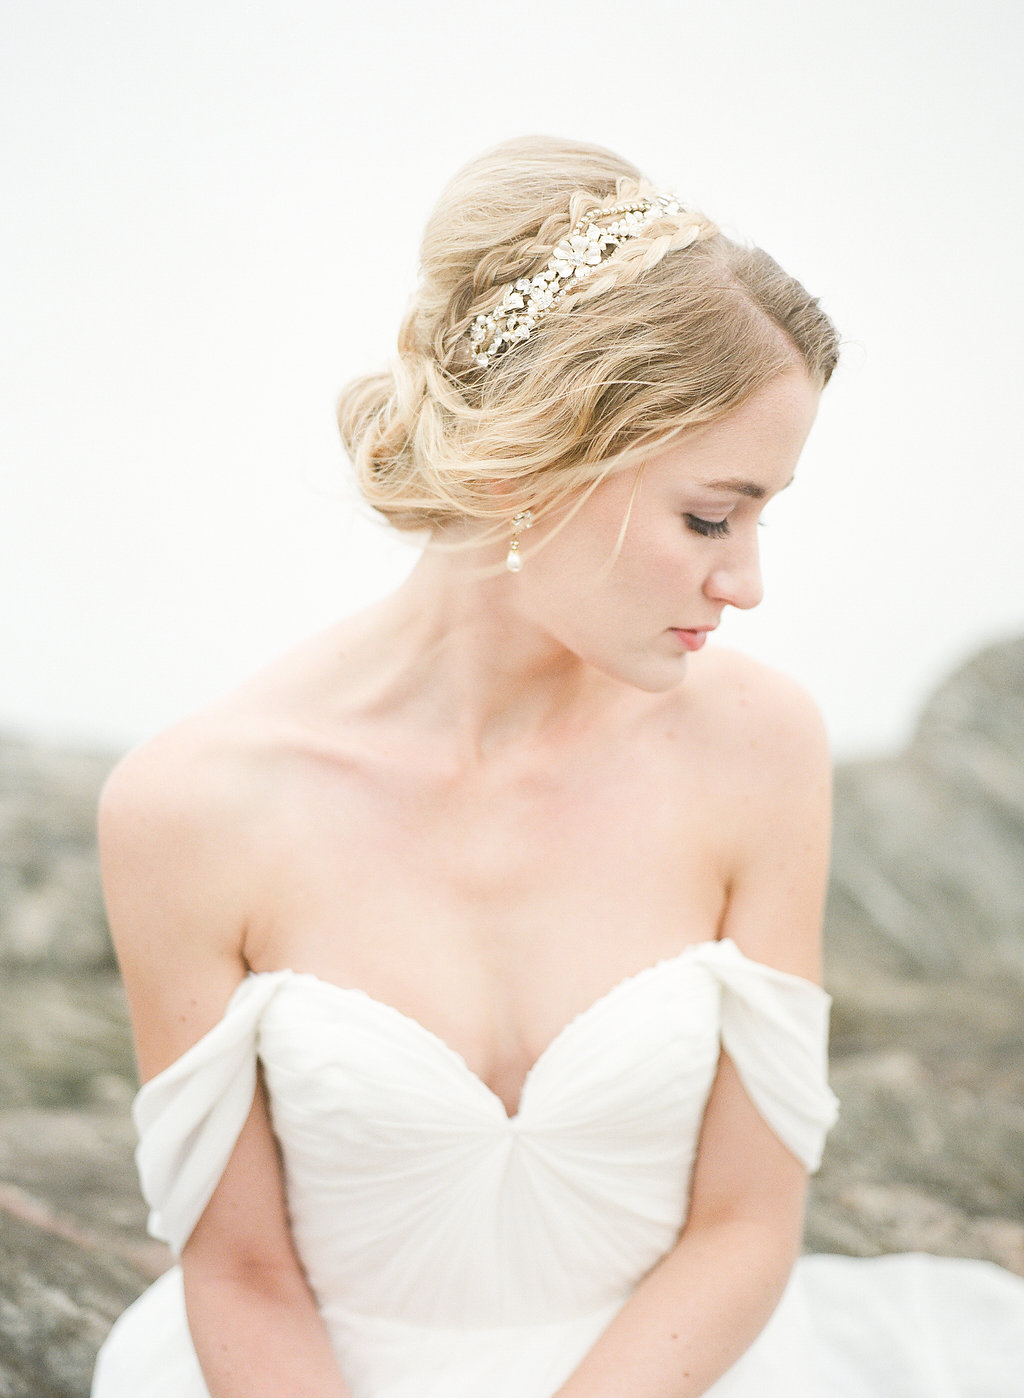 josie-photographs-urban-petals-mountain-wedding-north-carolina-mountain-wedding-ivory-and-beau-bridal-boutique-savannah-wedding-dresses-savannah-bridal-boutique-savannah-wedding-gowns-sarah-seven-lafayette-sarah-seven-wedding-dress-boho-bride-18.jpg